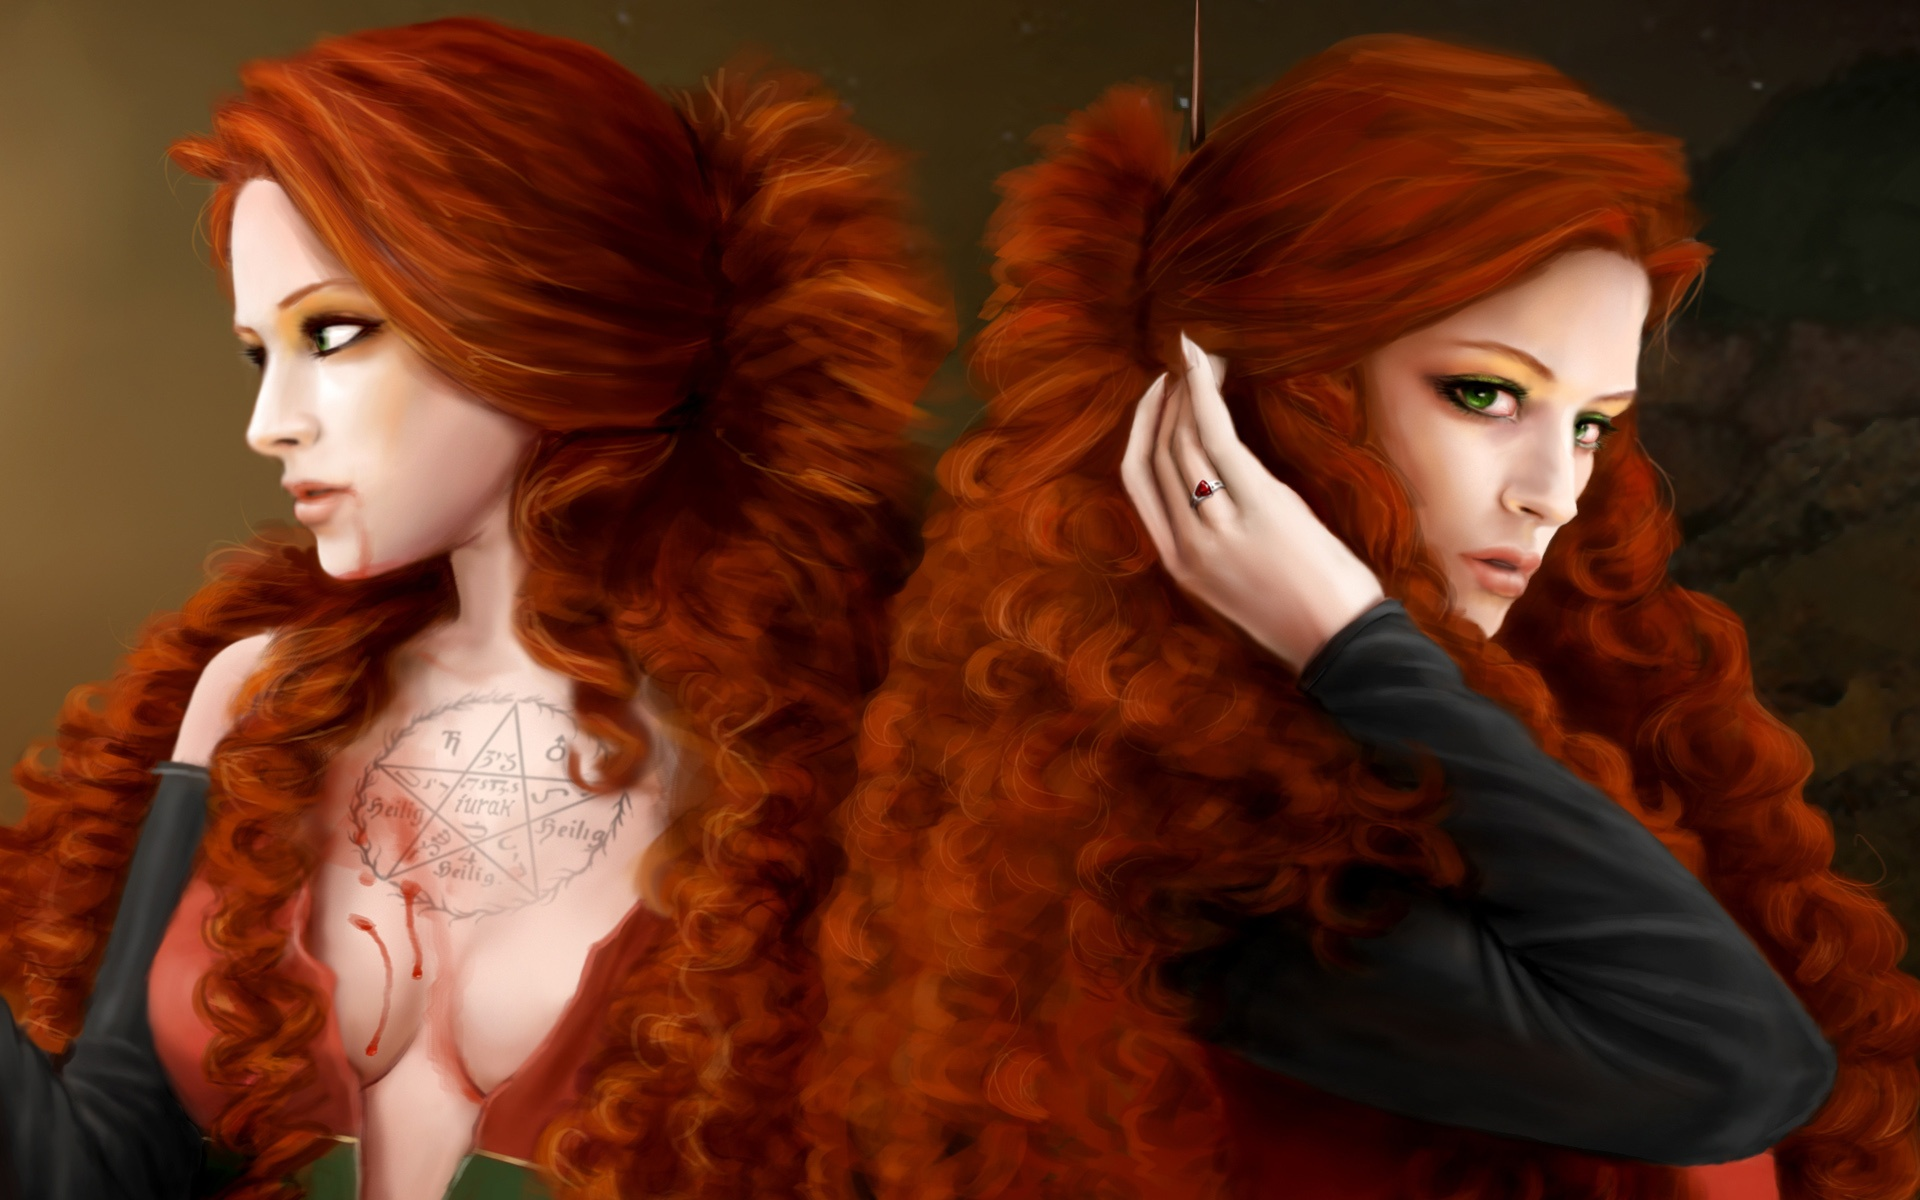 hair art wallpaper - photo #26